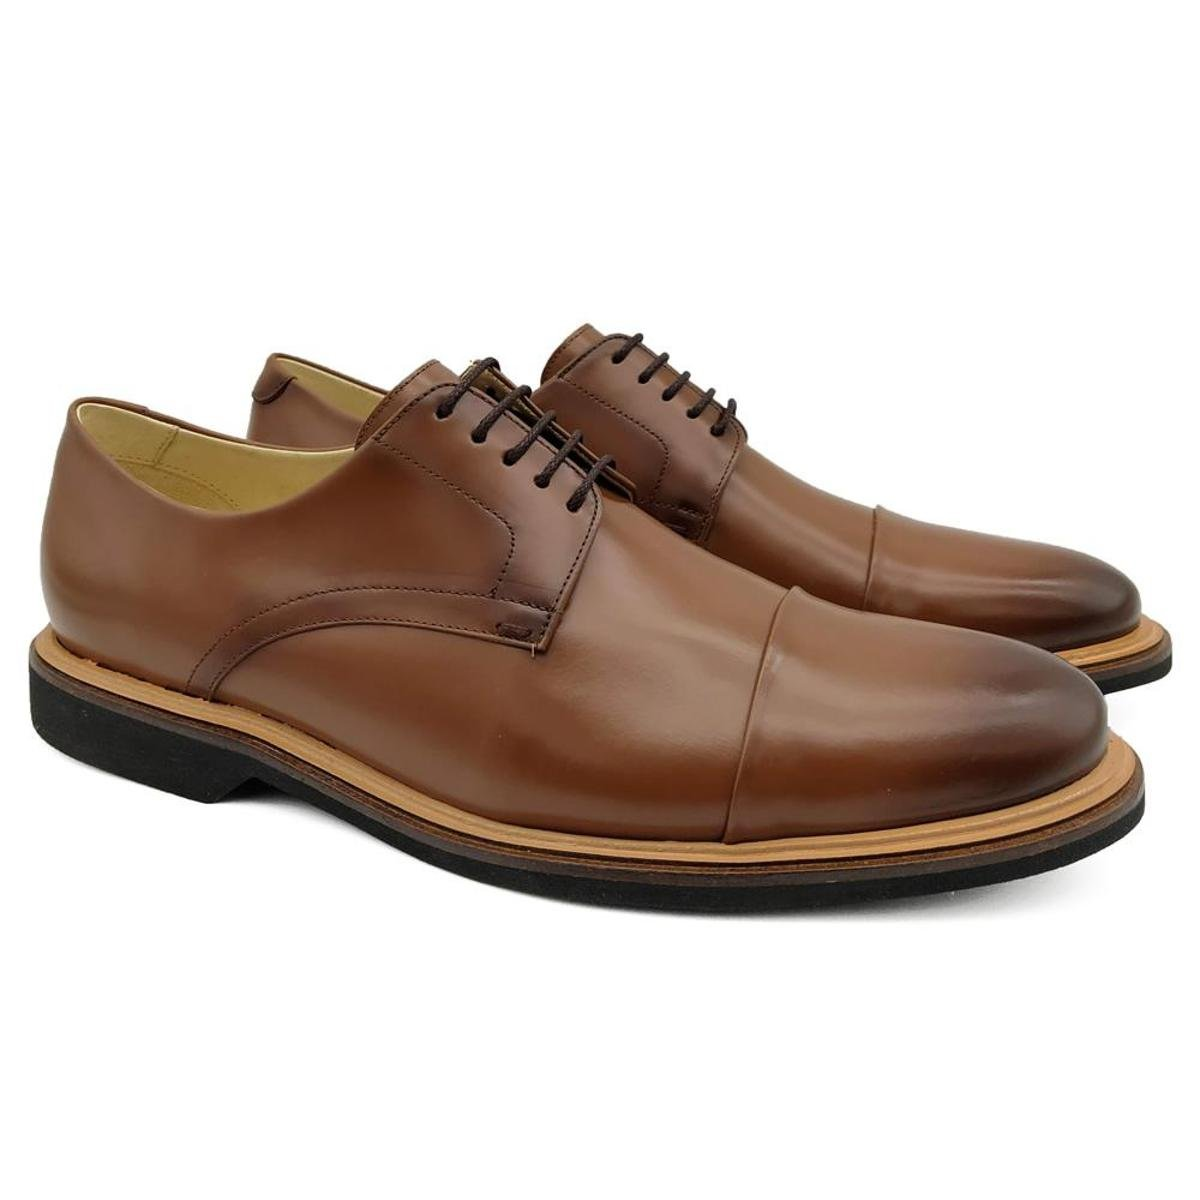 1d947dde7 Sapato Social Couro Adolfo Turrion Masculino Liso - Marrom Claro - Compre  Agora